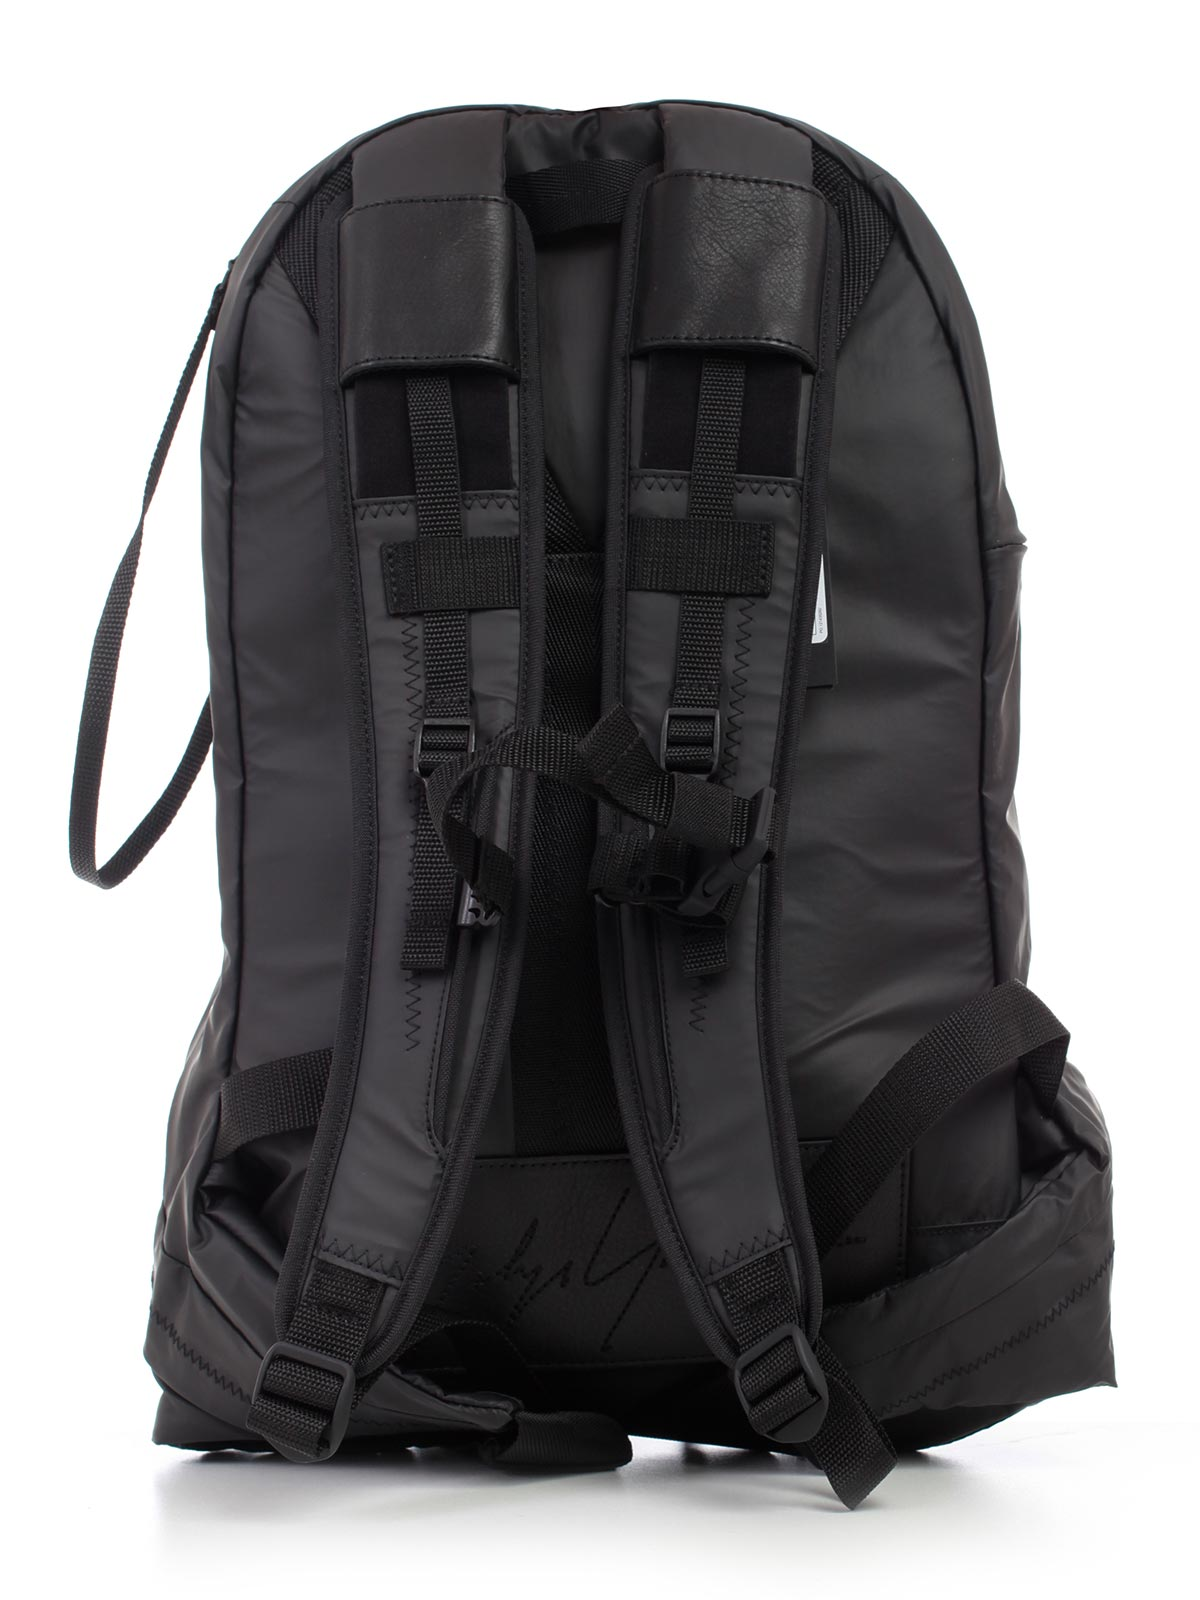 8ec81c675 Y-3 Yohji Yamamoto Adidas Bags DY0538 - BLACK.Bernardelli Store ...